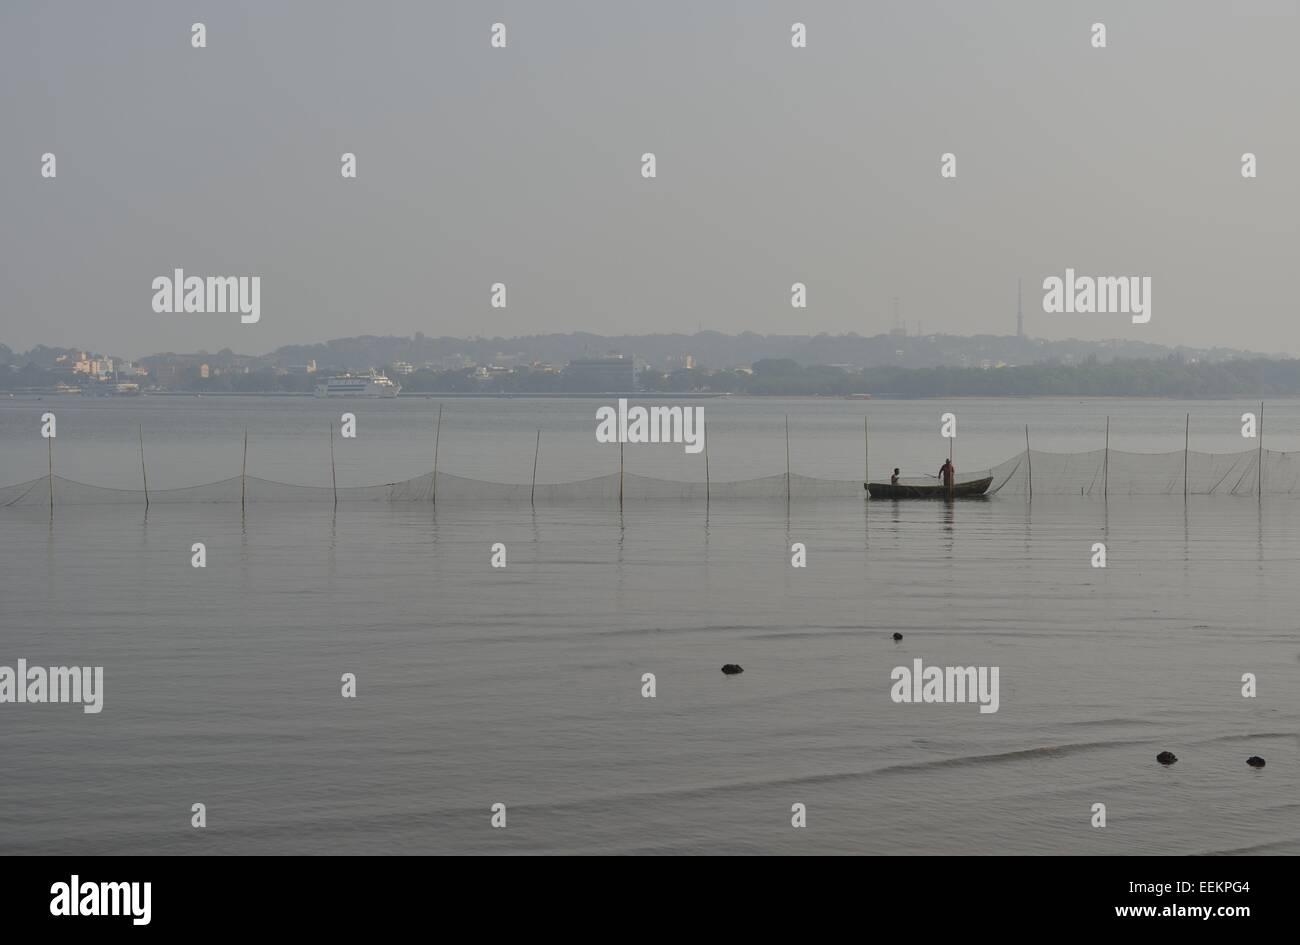 Fisher boat in Goa, India - Stock Image